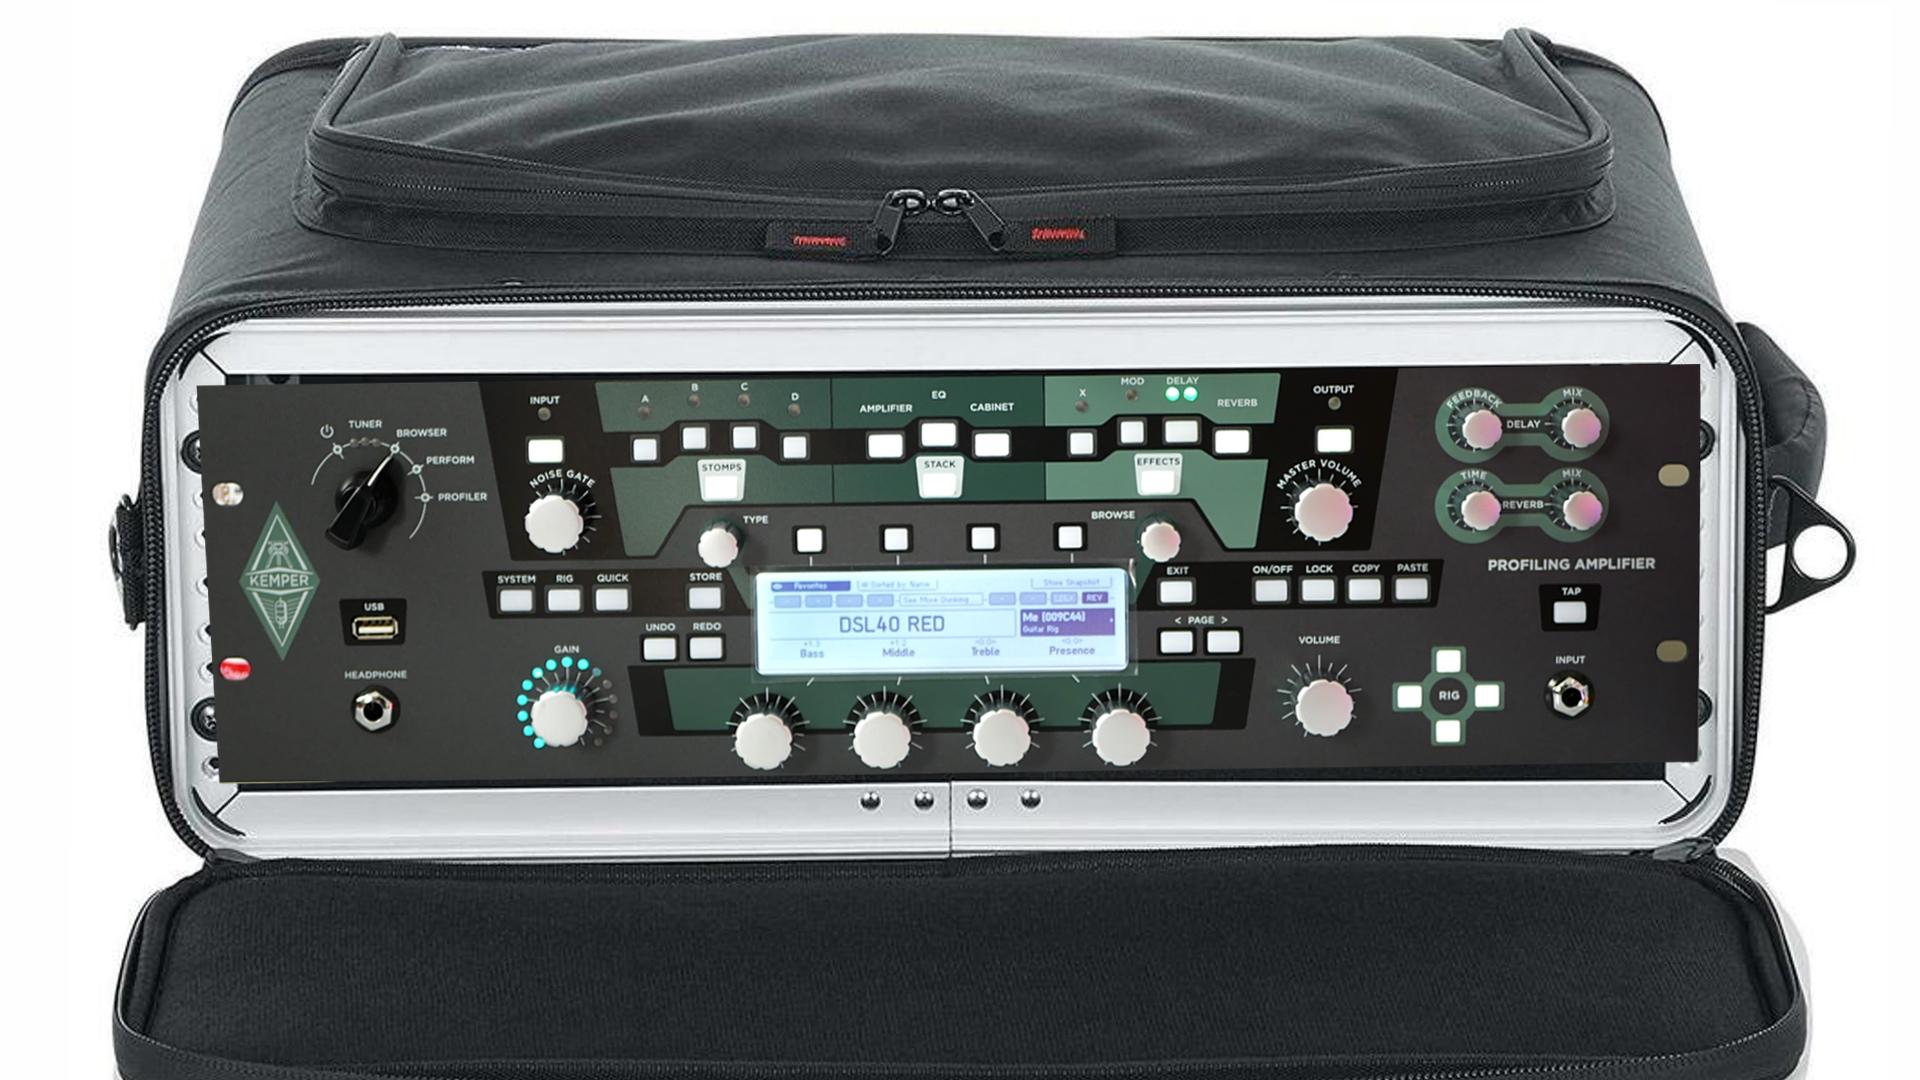 Kemper Profiling Amplifier Rack Cases